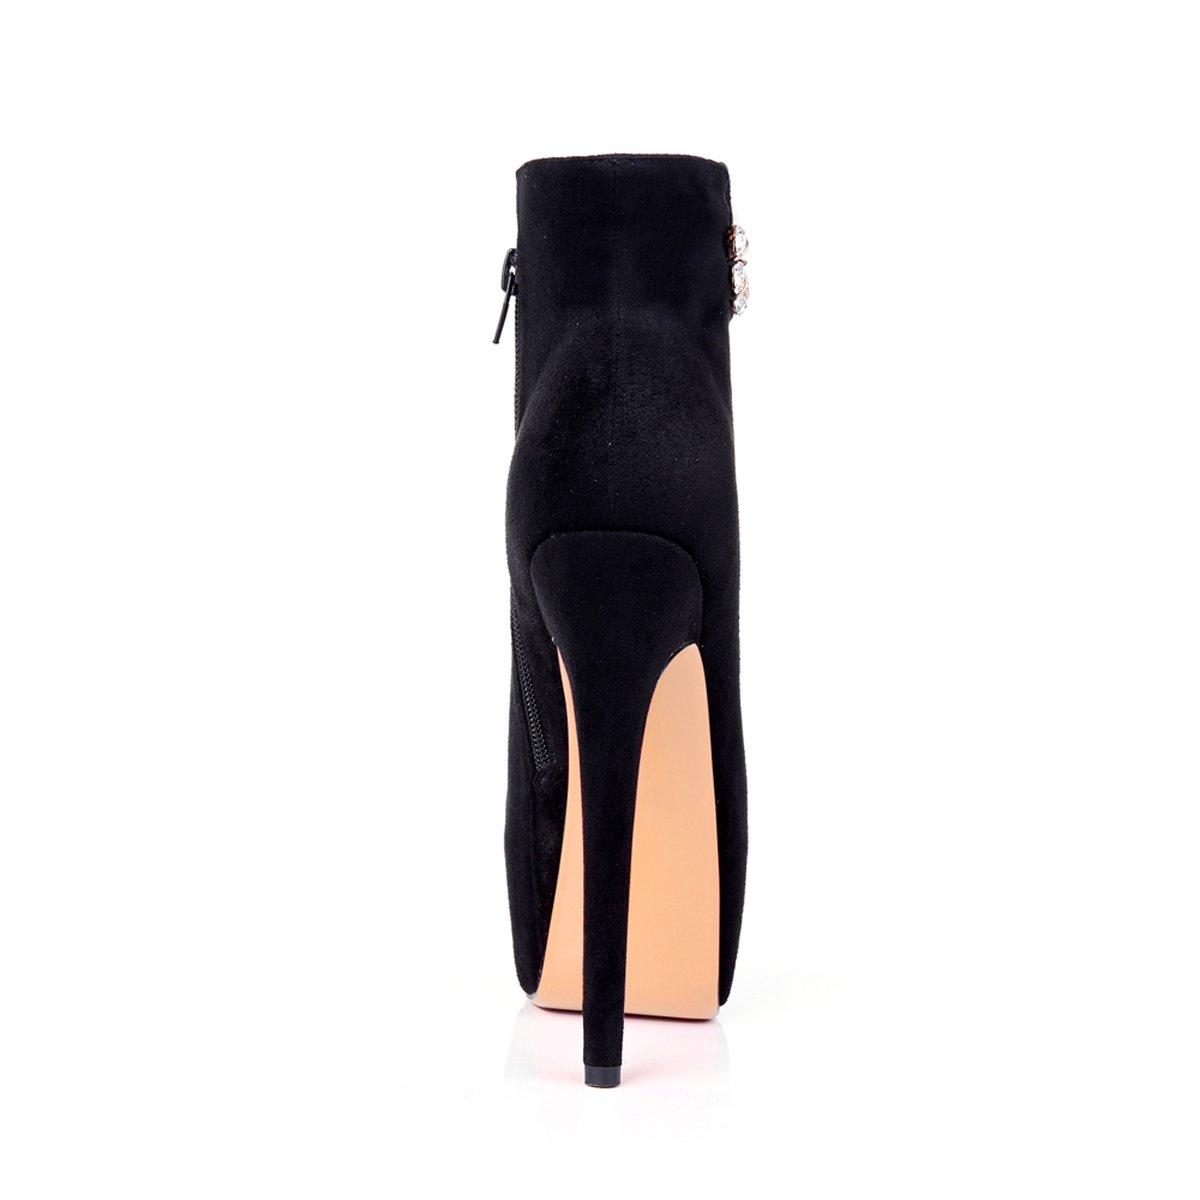 Onlymaker Damen Pumps Stiletto Stiefel High Heels Kurzschaft Stiefelette mit mit Stiefelette Plateau Schwarz Shin e1ce0a